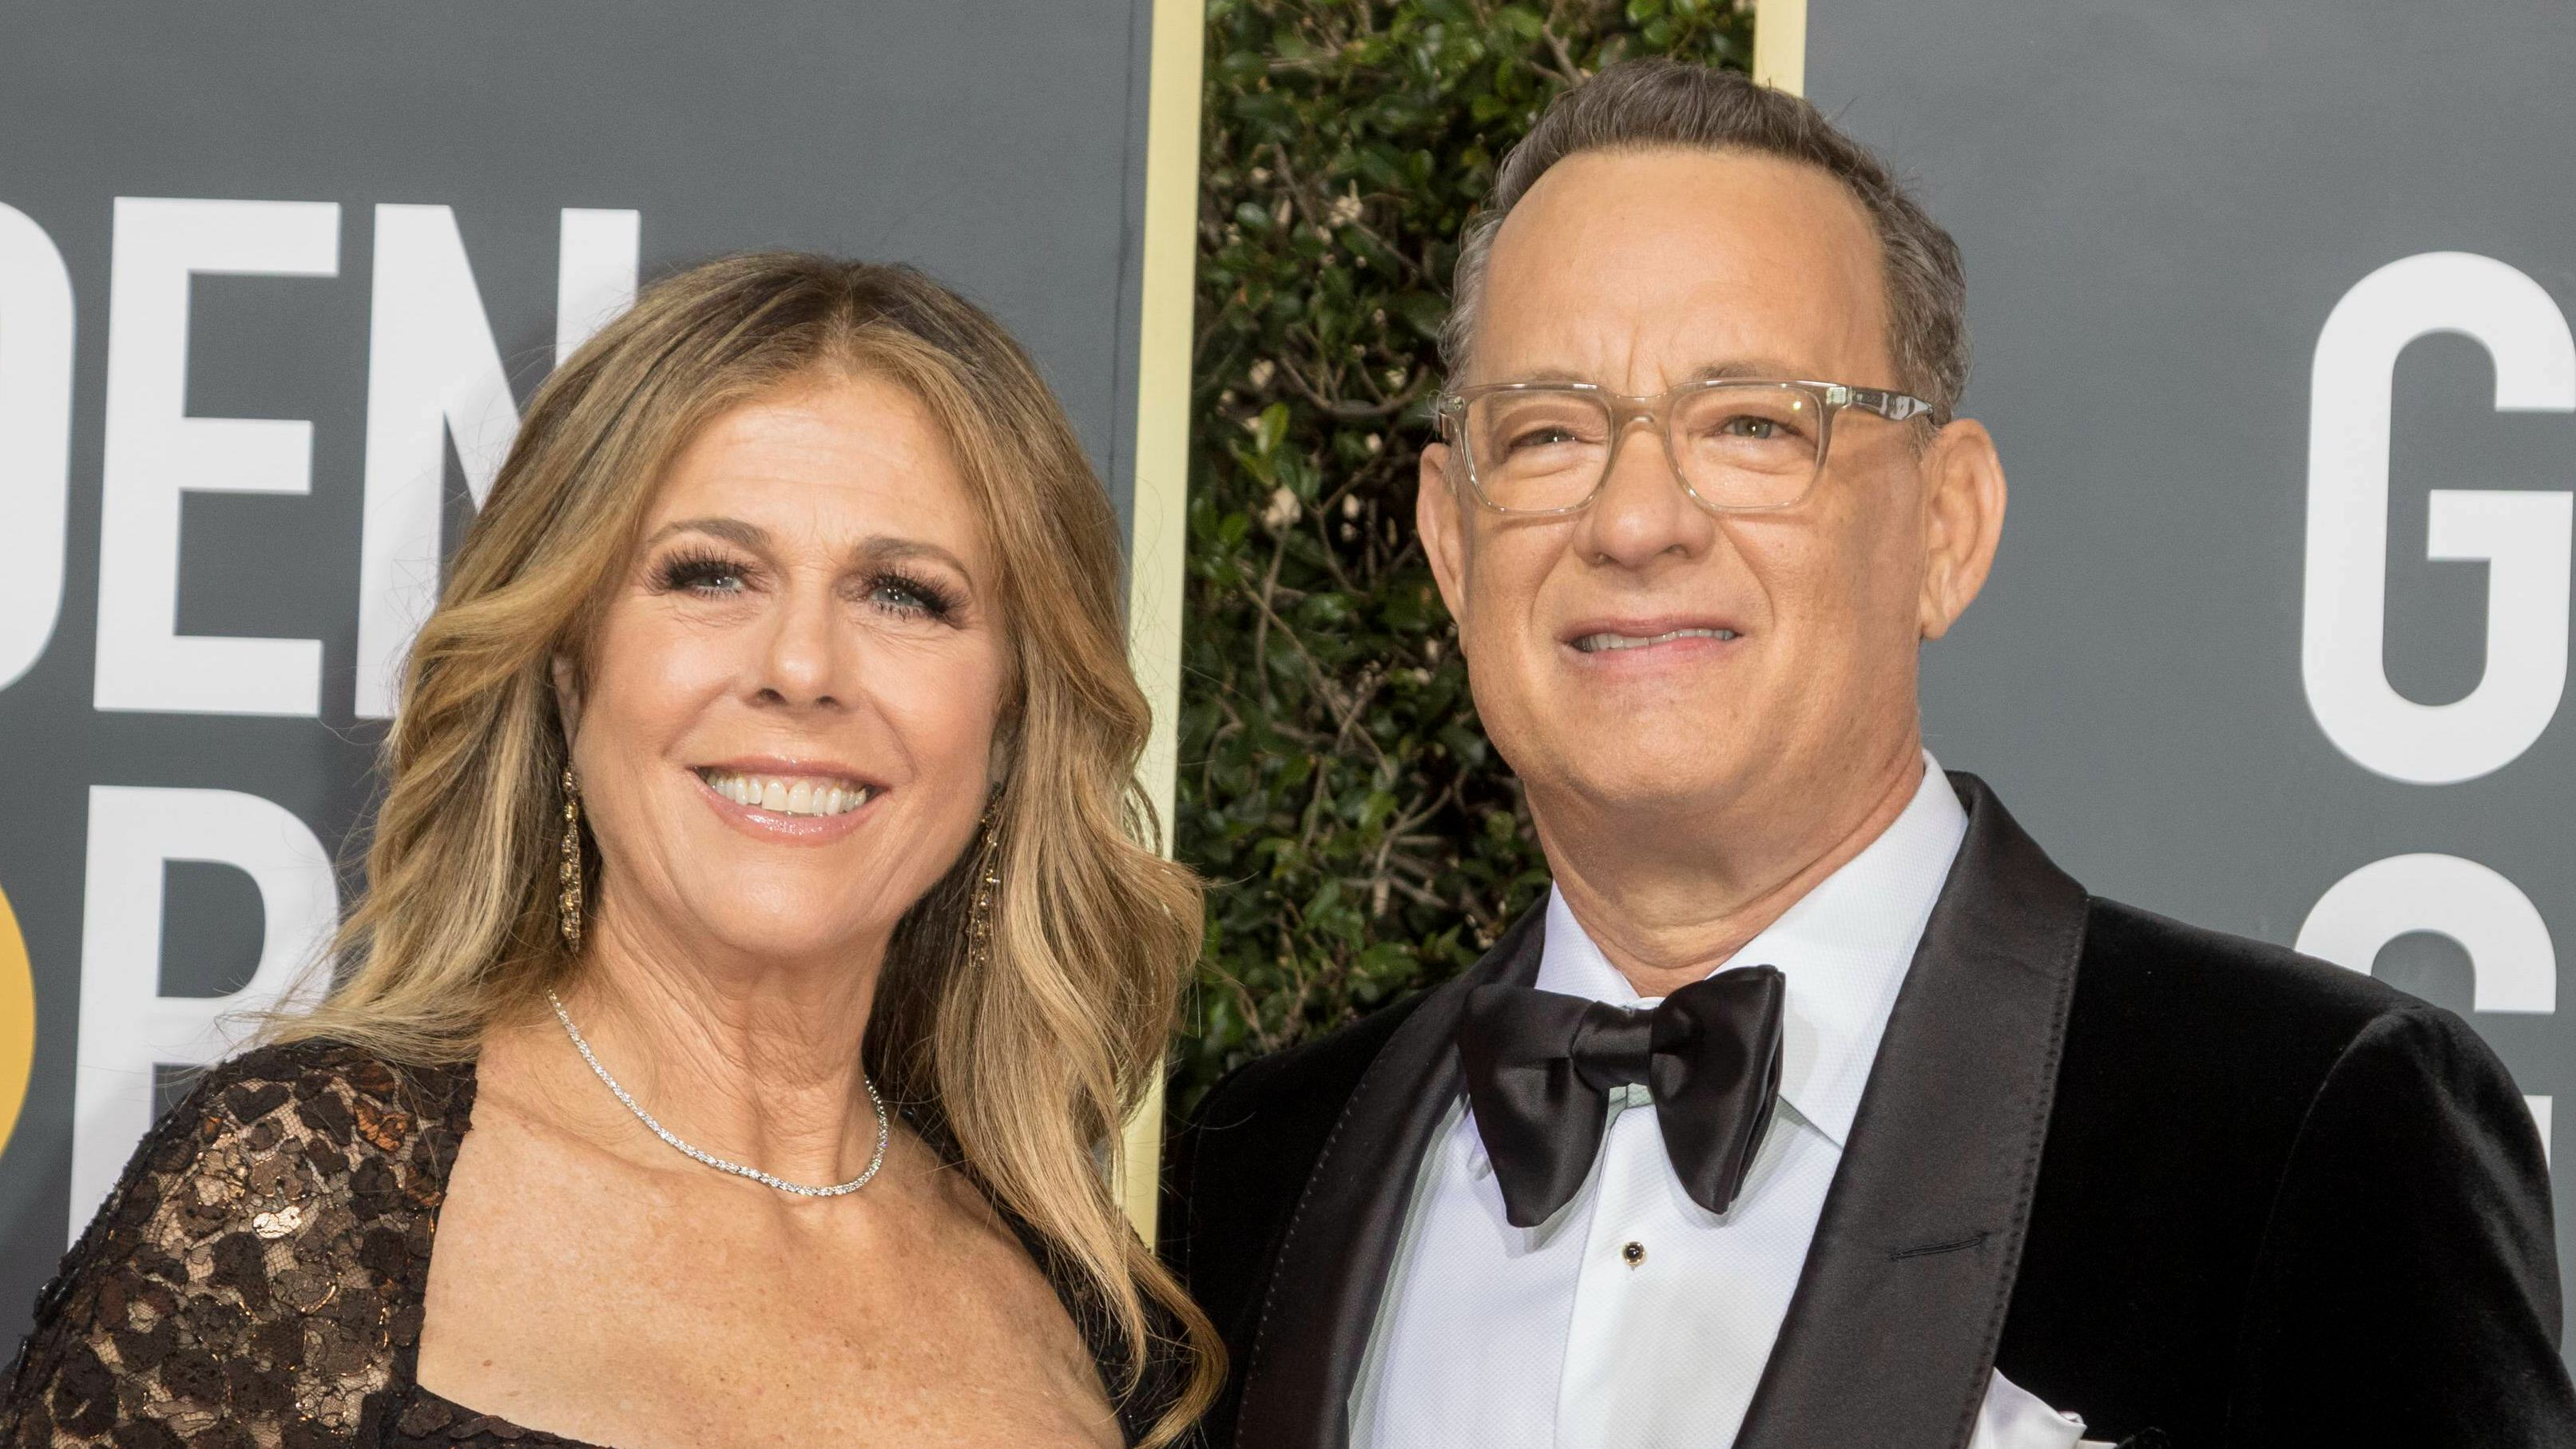 Tom Hanks – Violators of COVID-19 don't have my respect